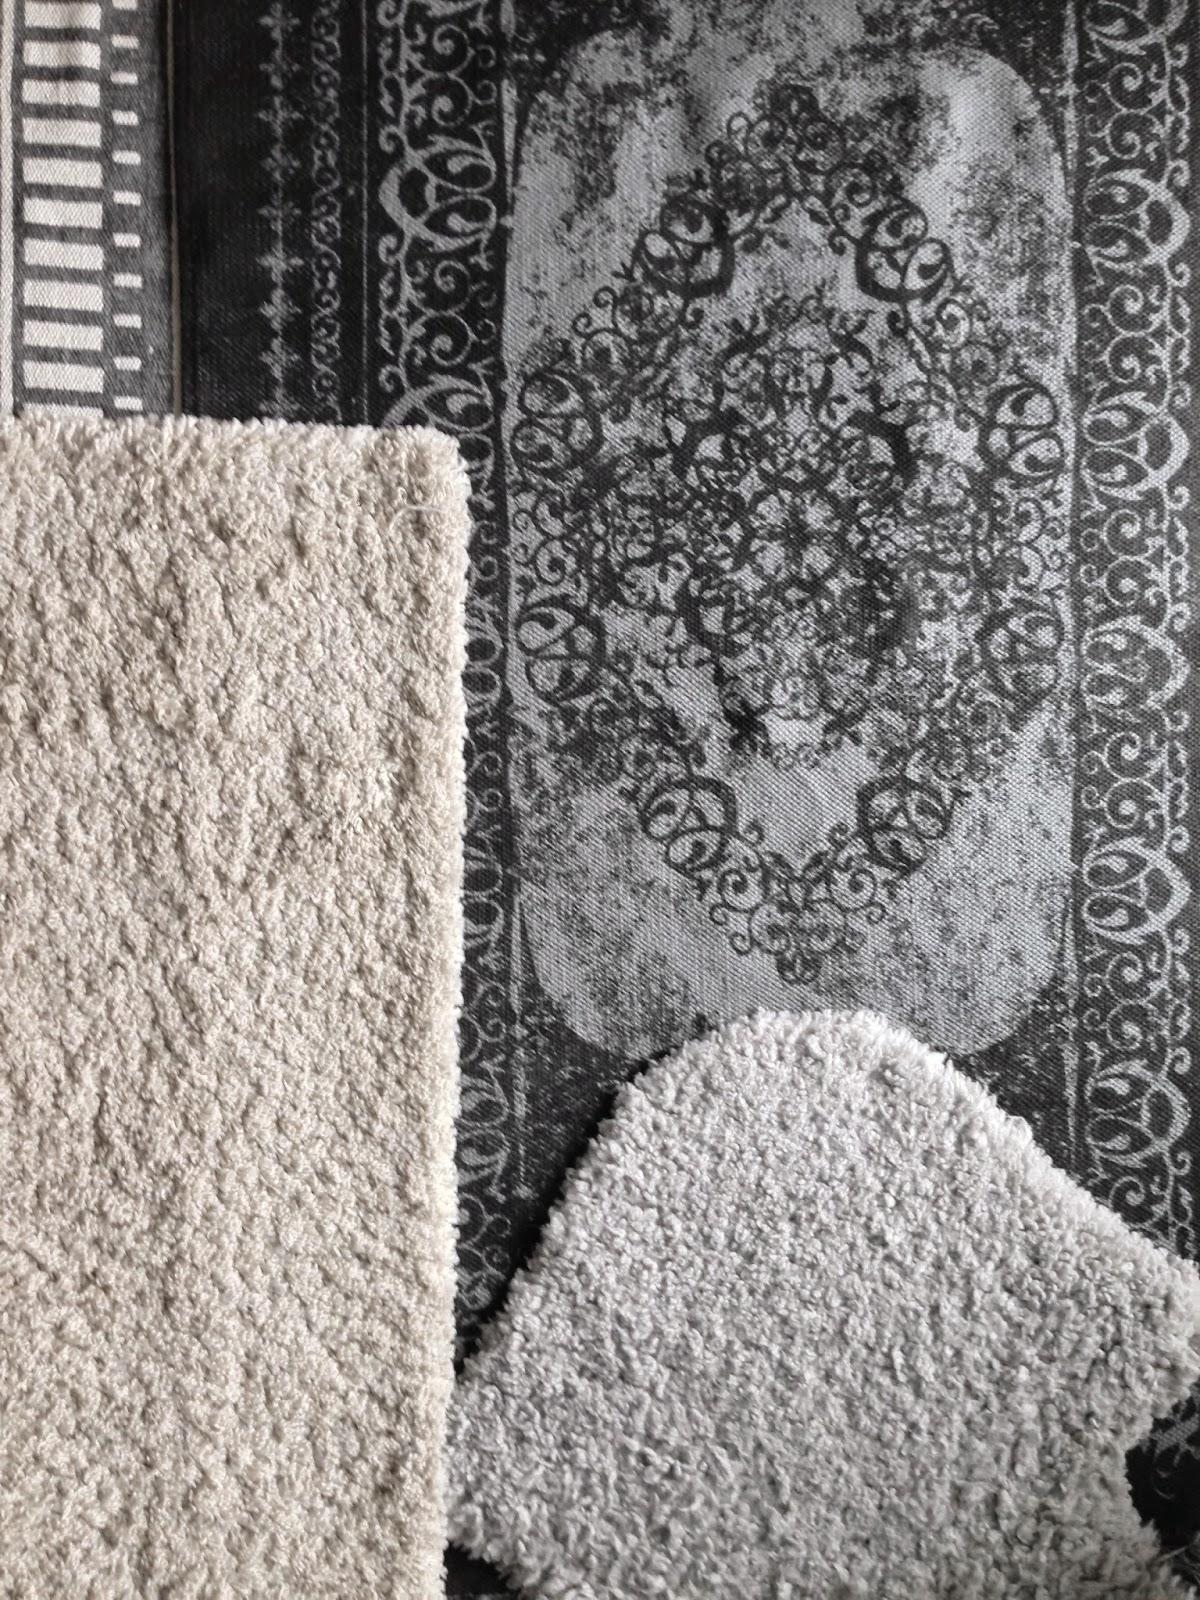 HM Home, Ikea, Granit, Mattor, Rugs